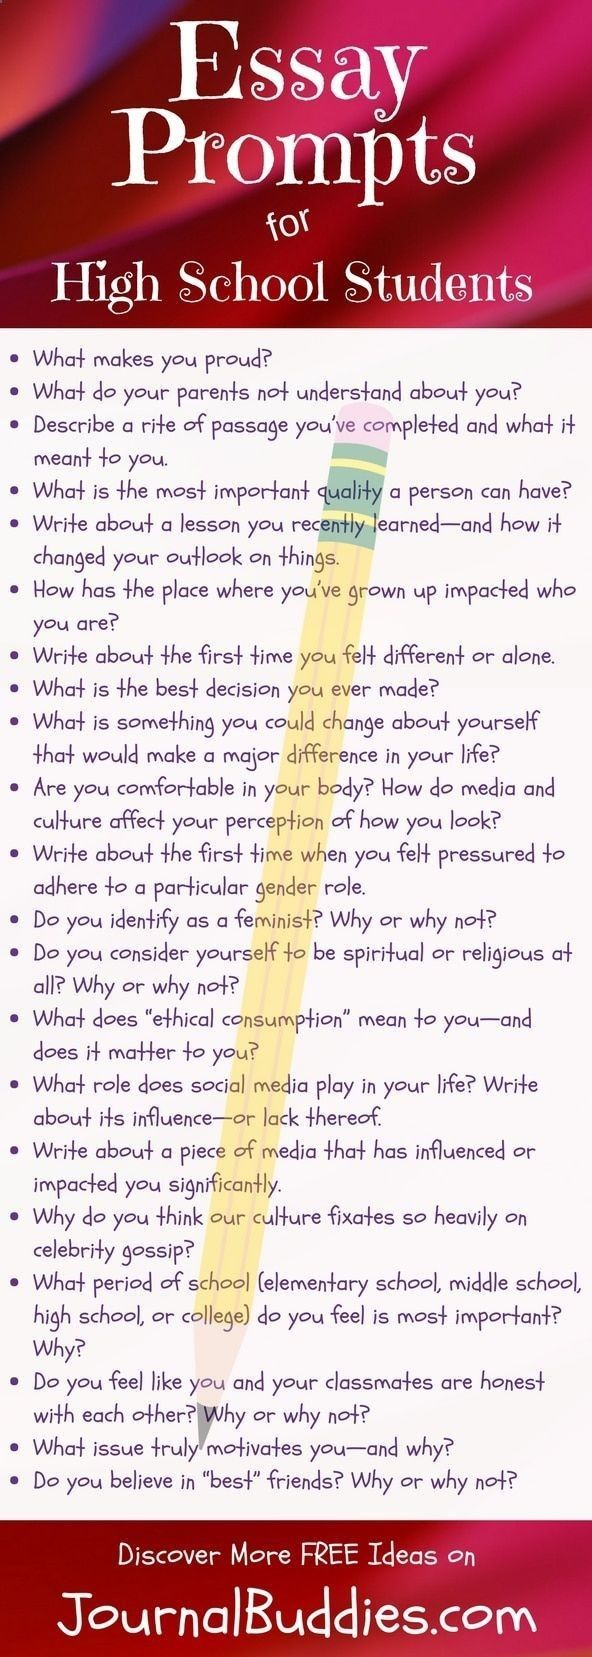 teaching essay writing to high school students